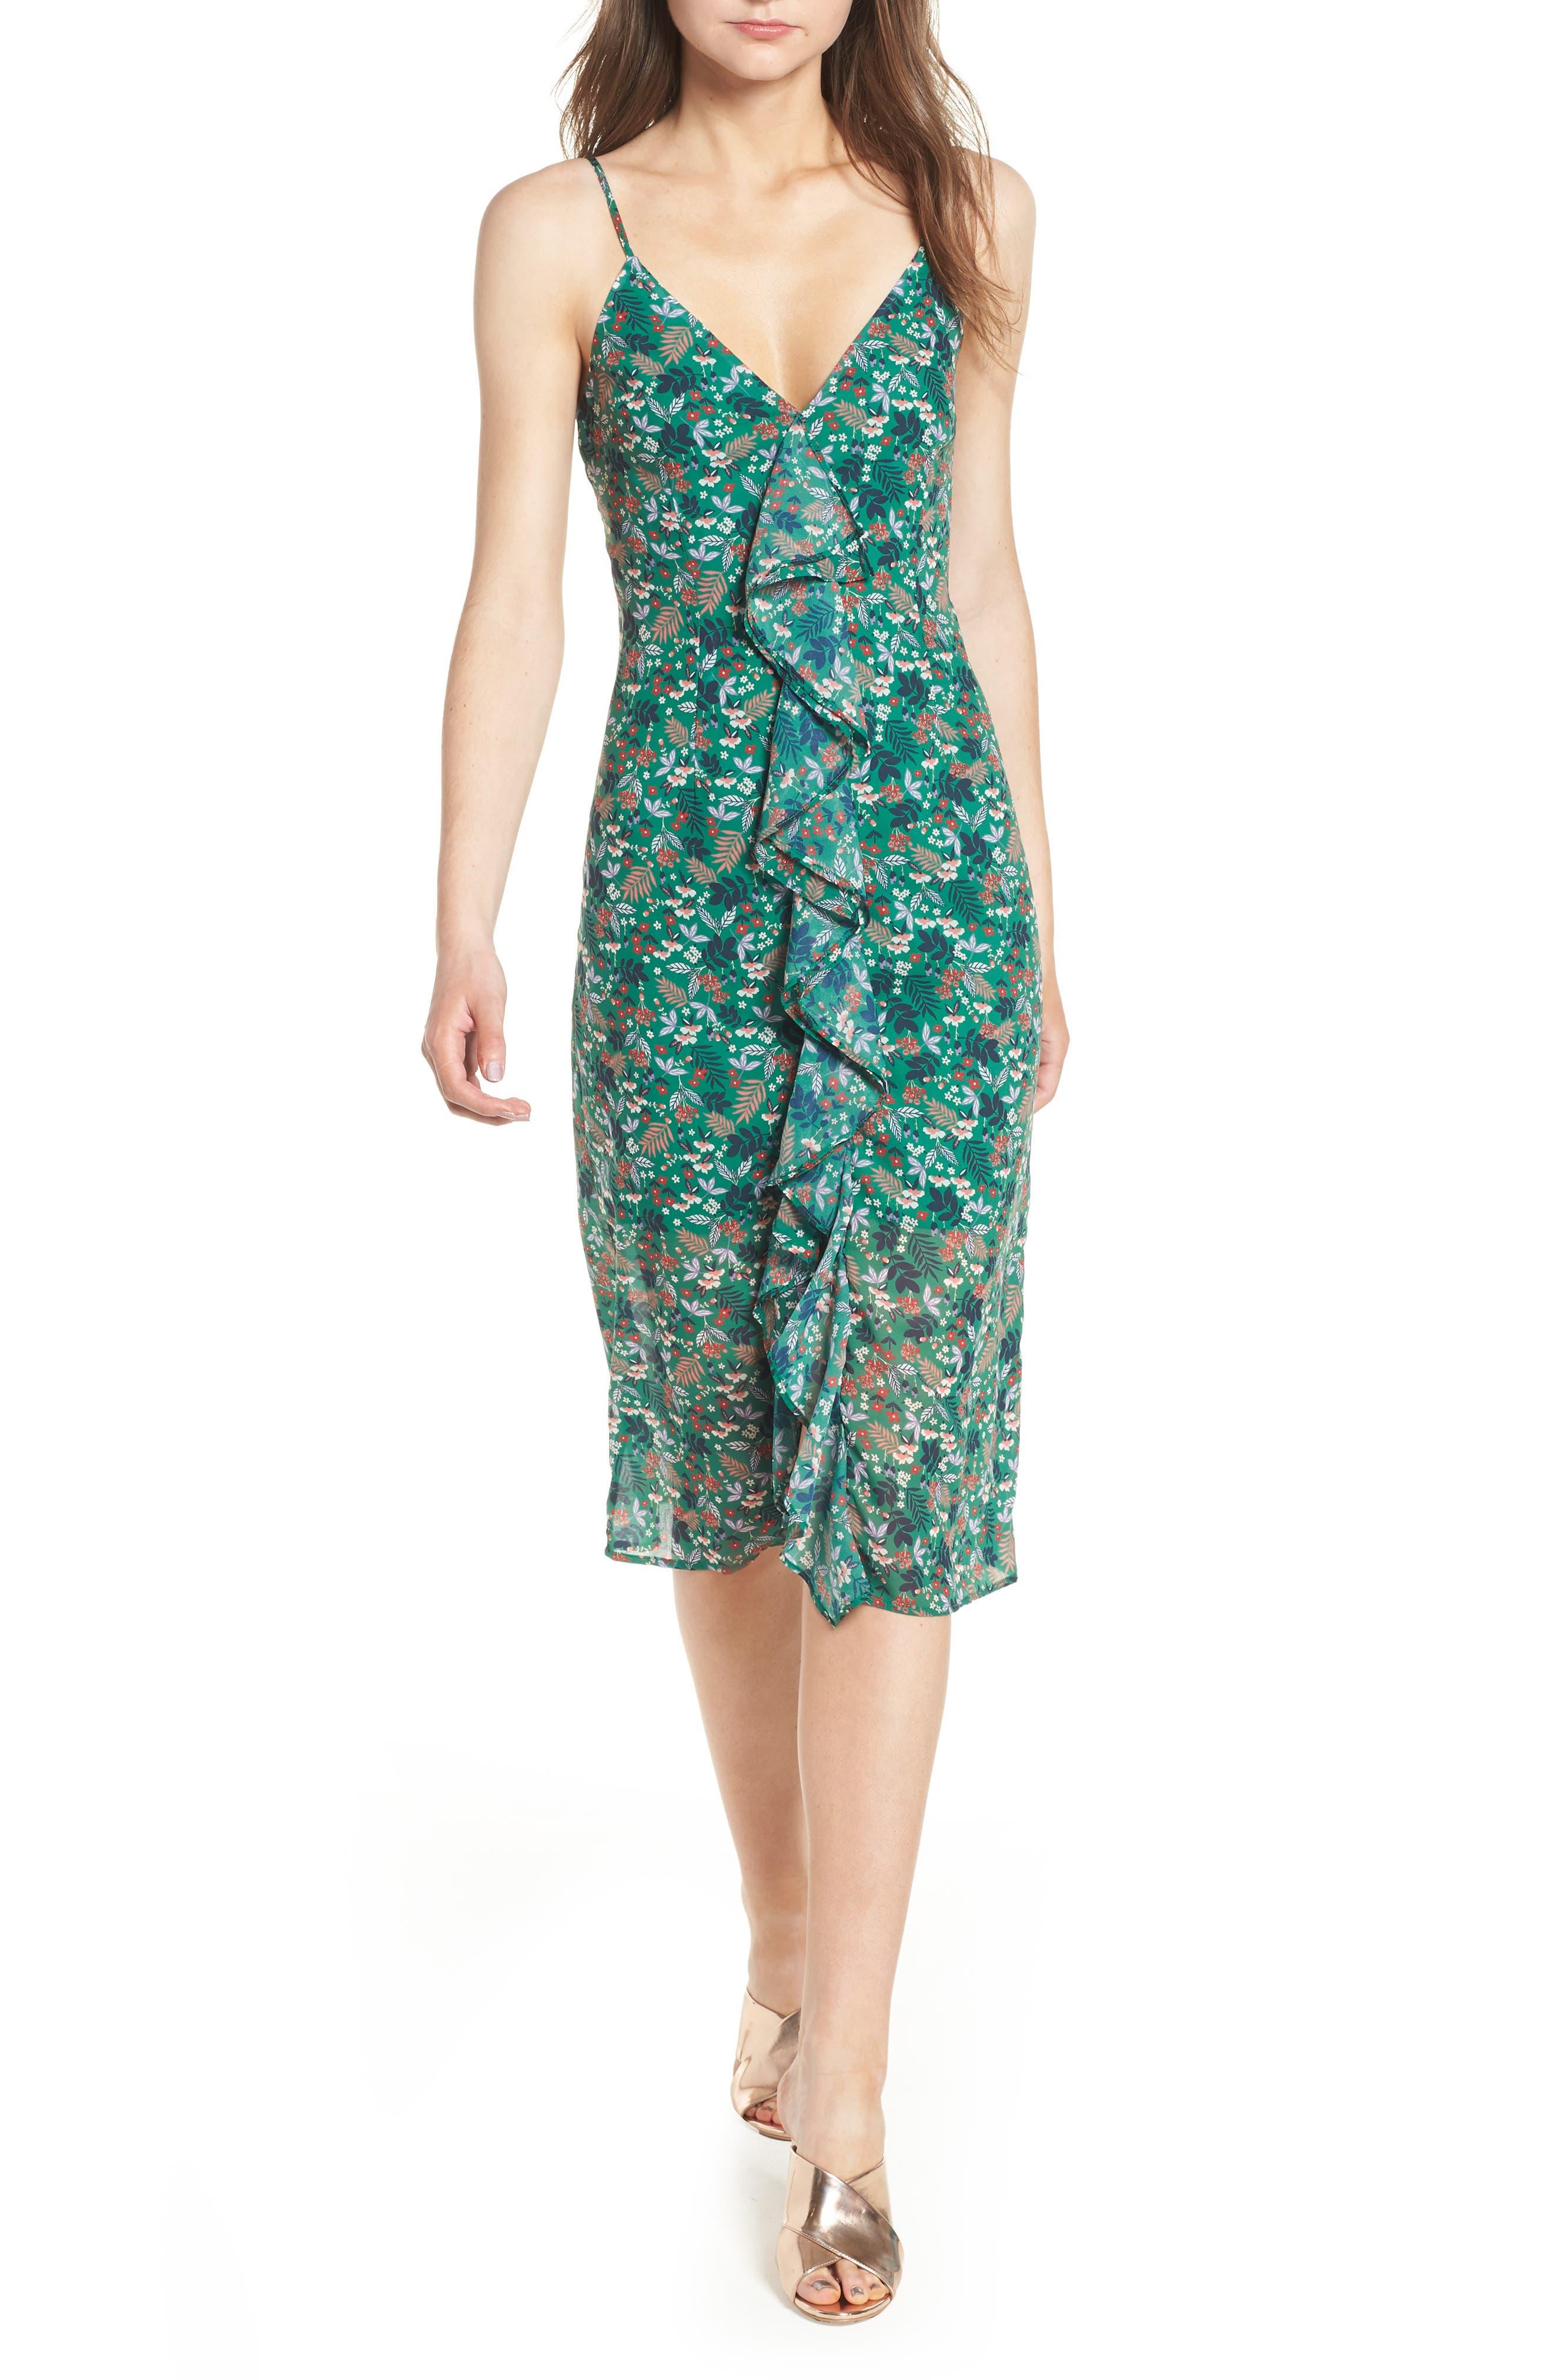 Viridian Ruffle Floral Print Dress,                             Main thumbnail 1, color,                             305